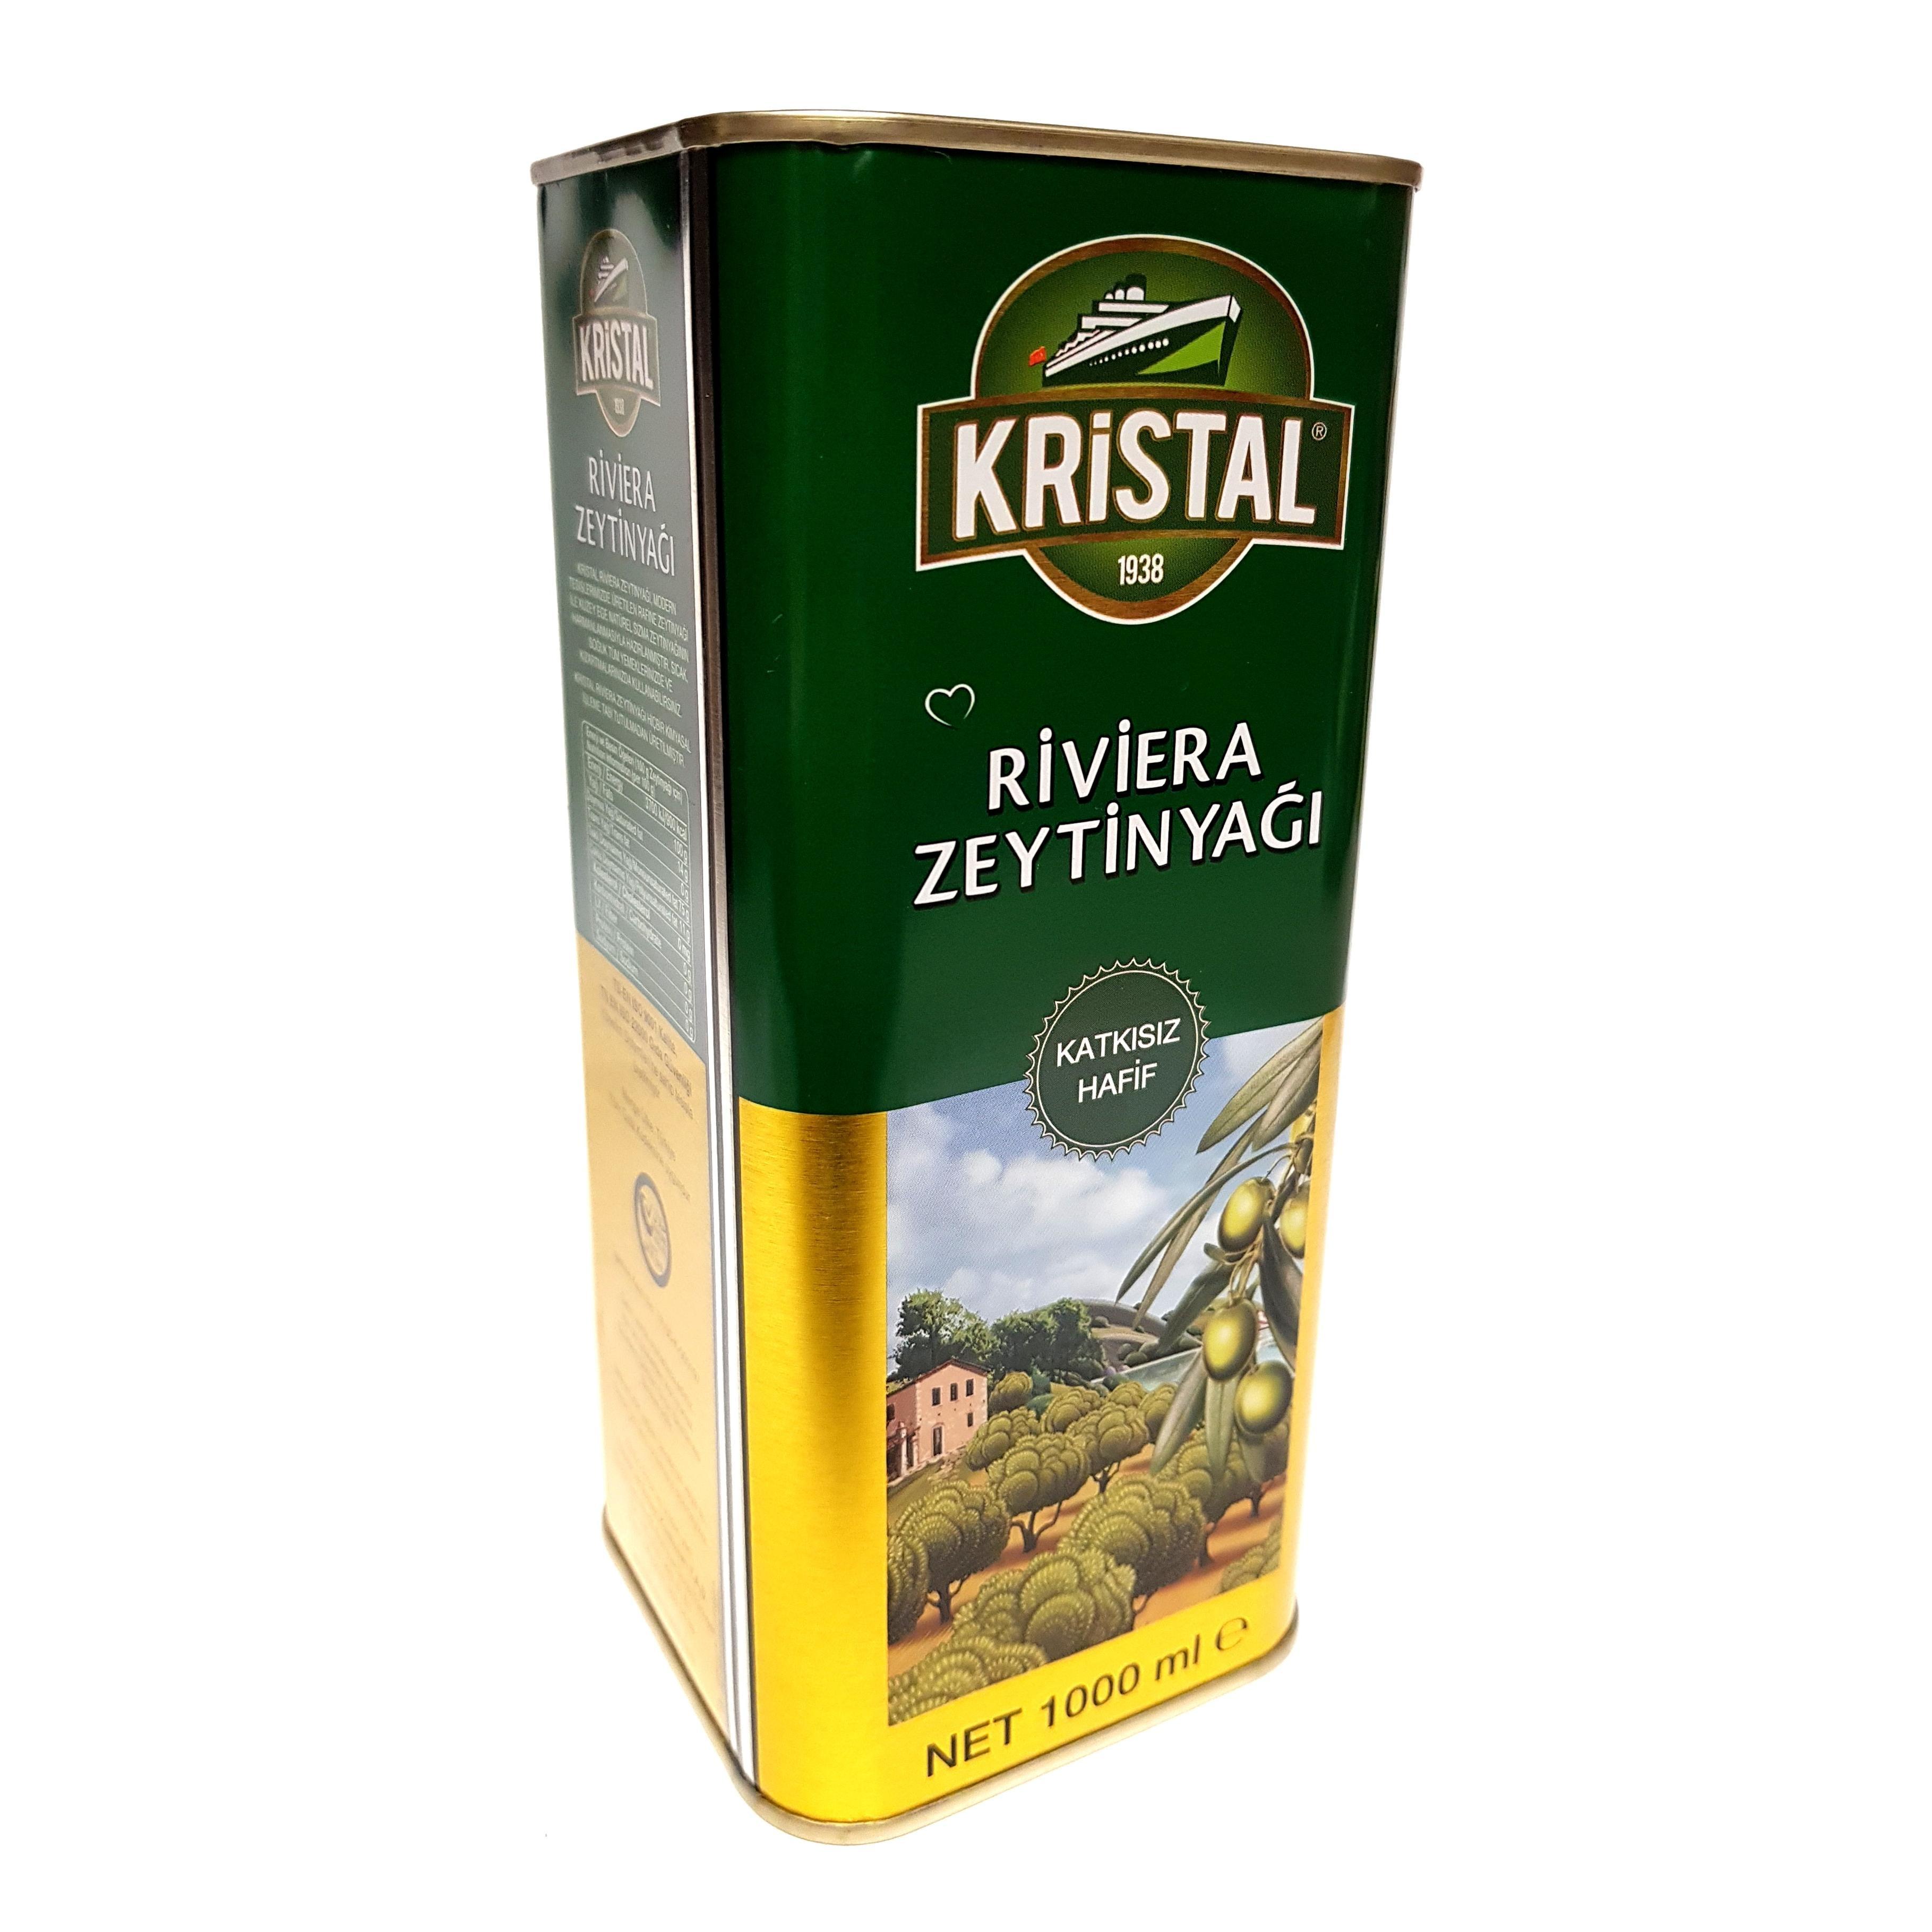 Kristal Riviera raffiniertes Olivenöl (1000ml)